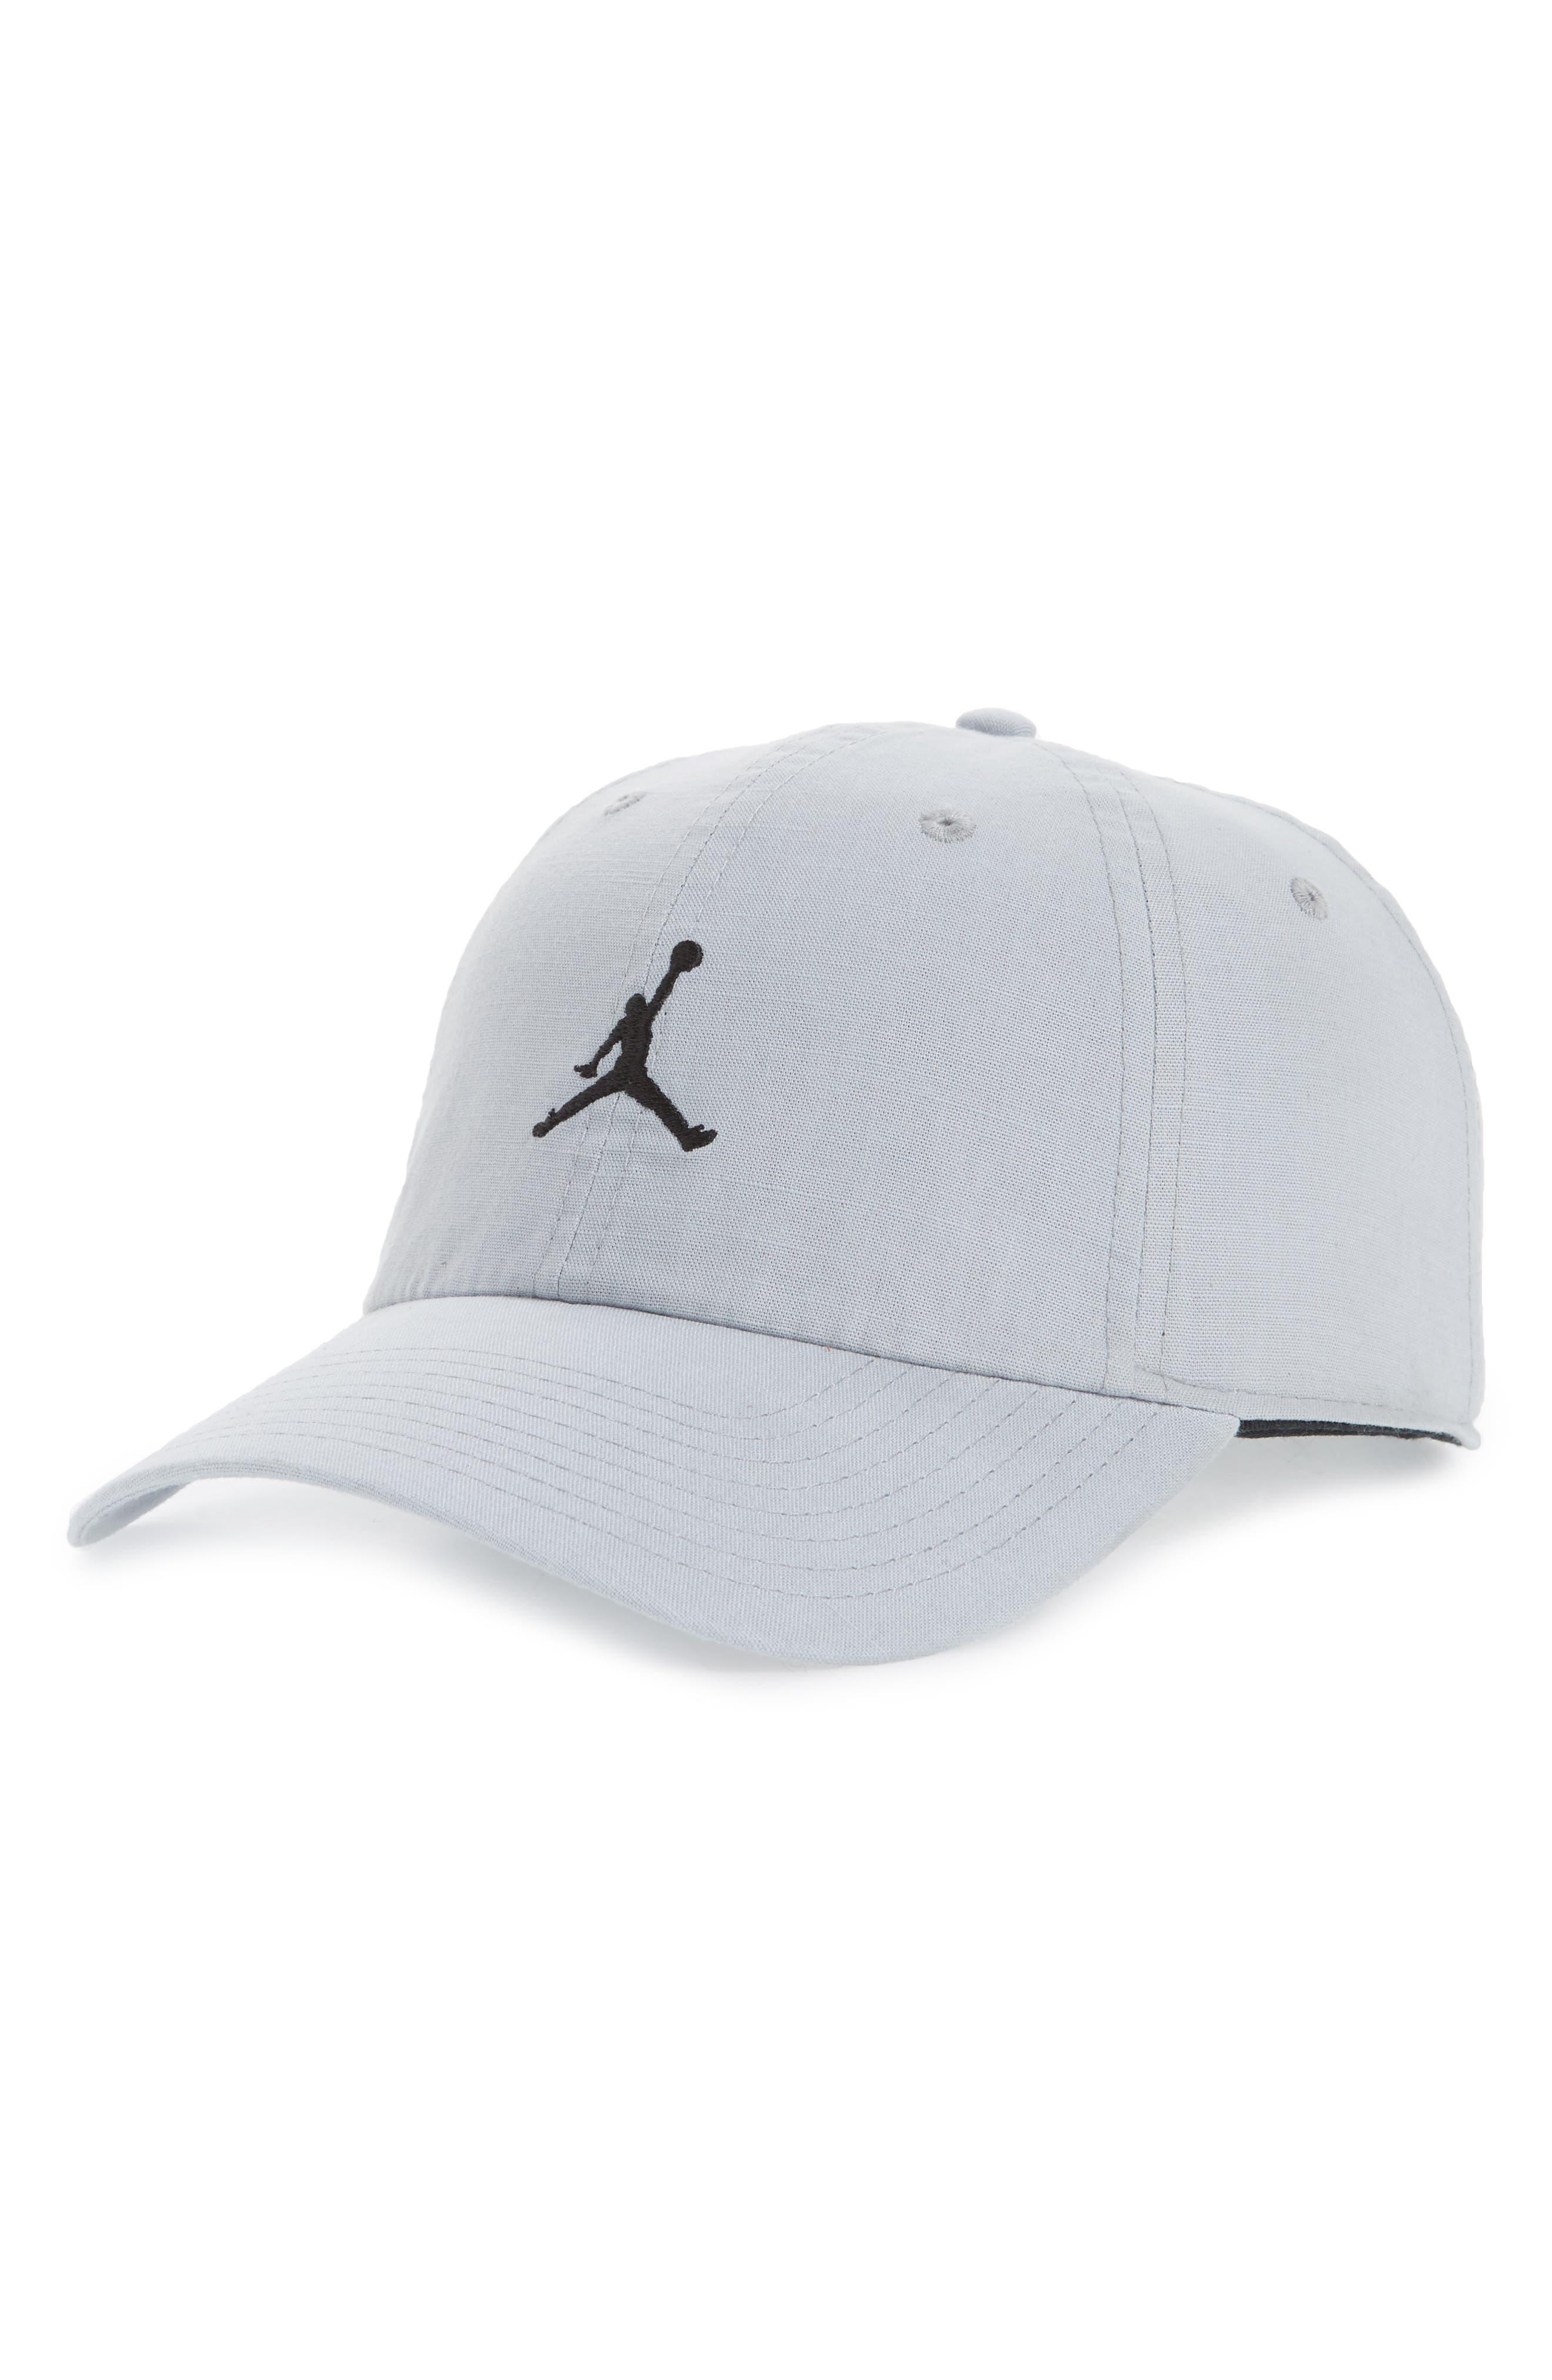 Jordan H86 Jumpman Washed Baseball Cap,                         Main,                         color, Wolf Grey/ Black